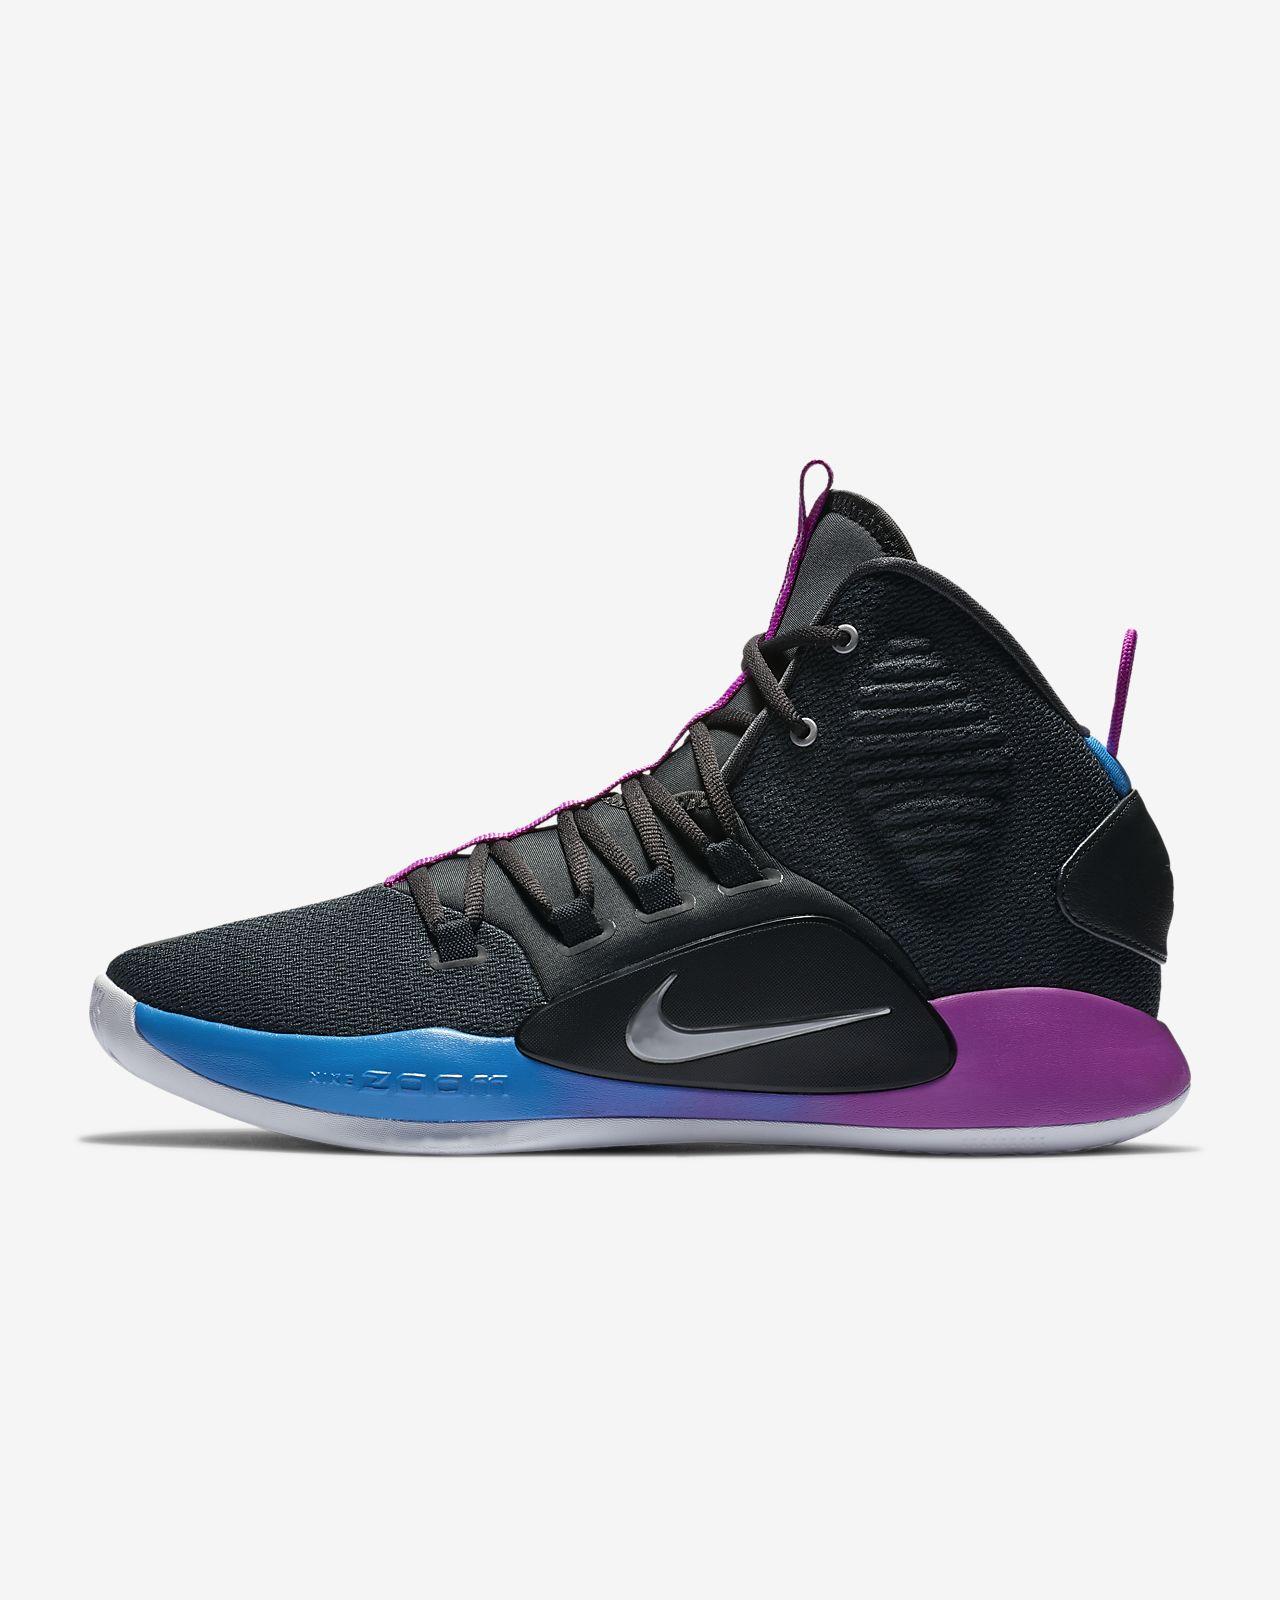 timeless design d86e6 c802b Low Resolution Nike Hyperdunk X Basketbalschoen Nike Hyperdunk X  Basketbalschoen